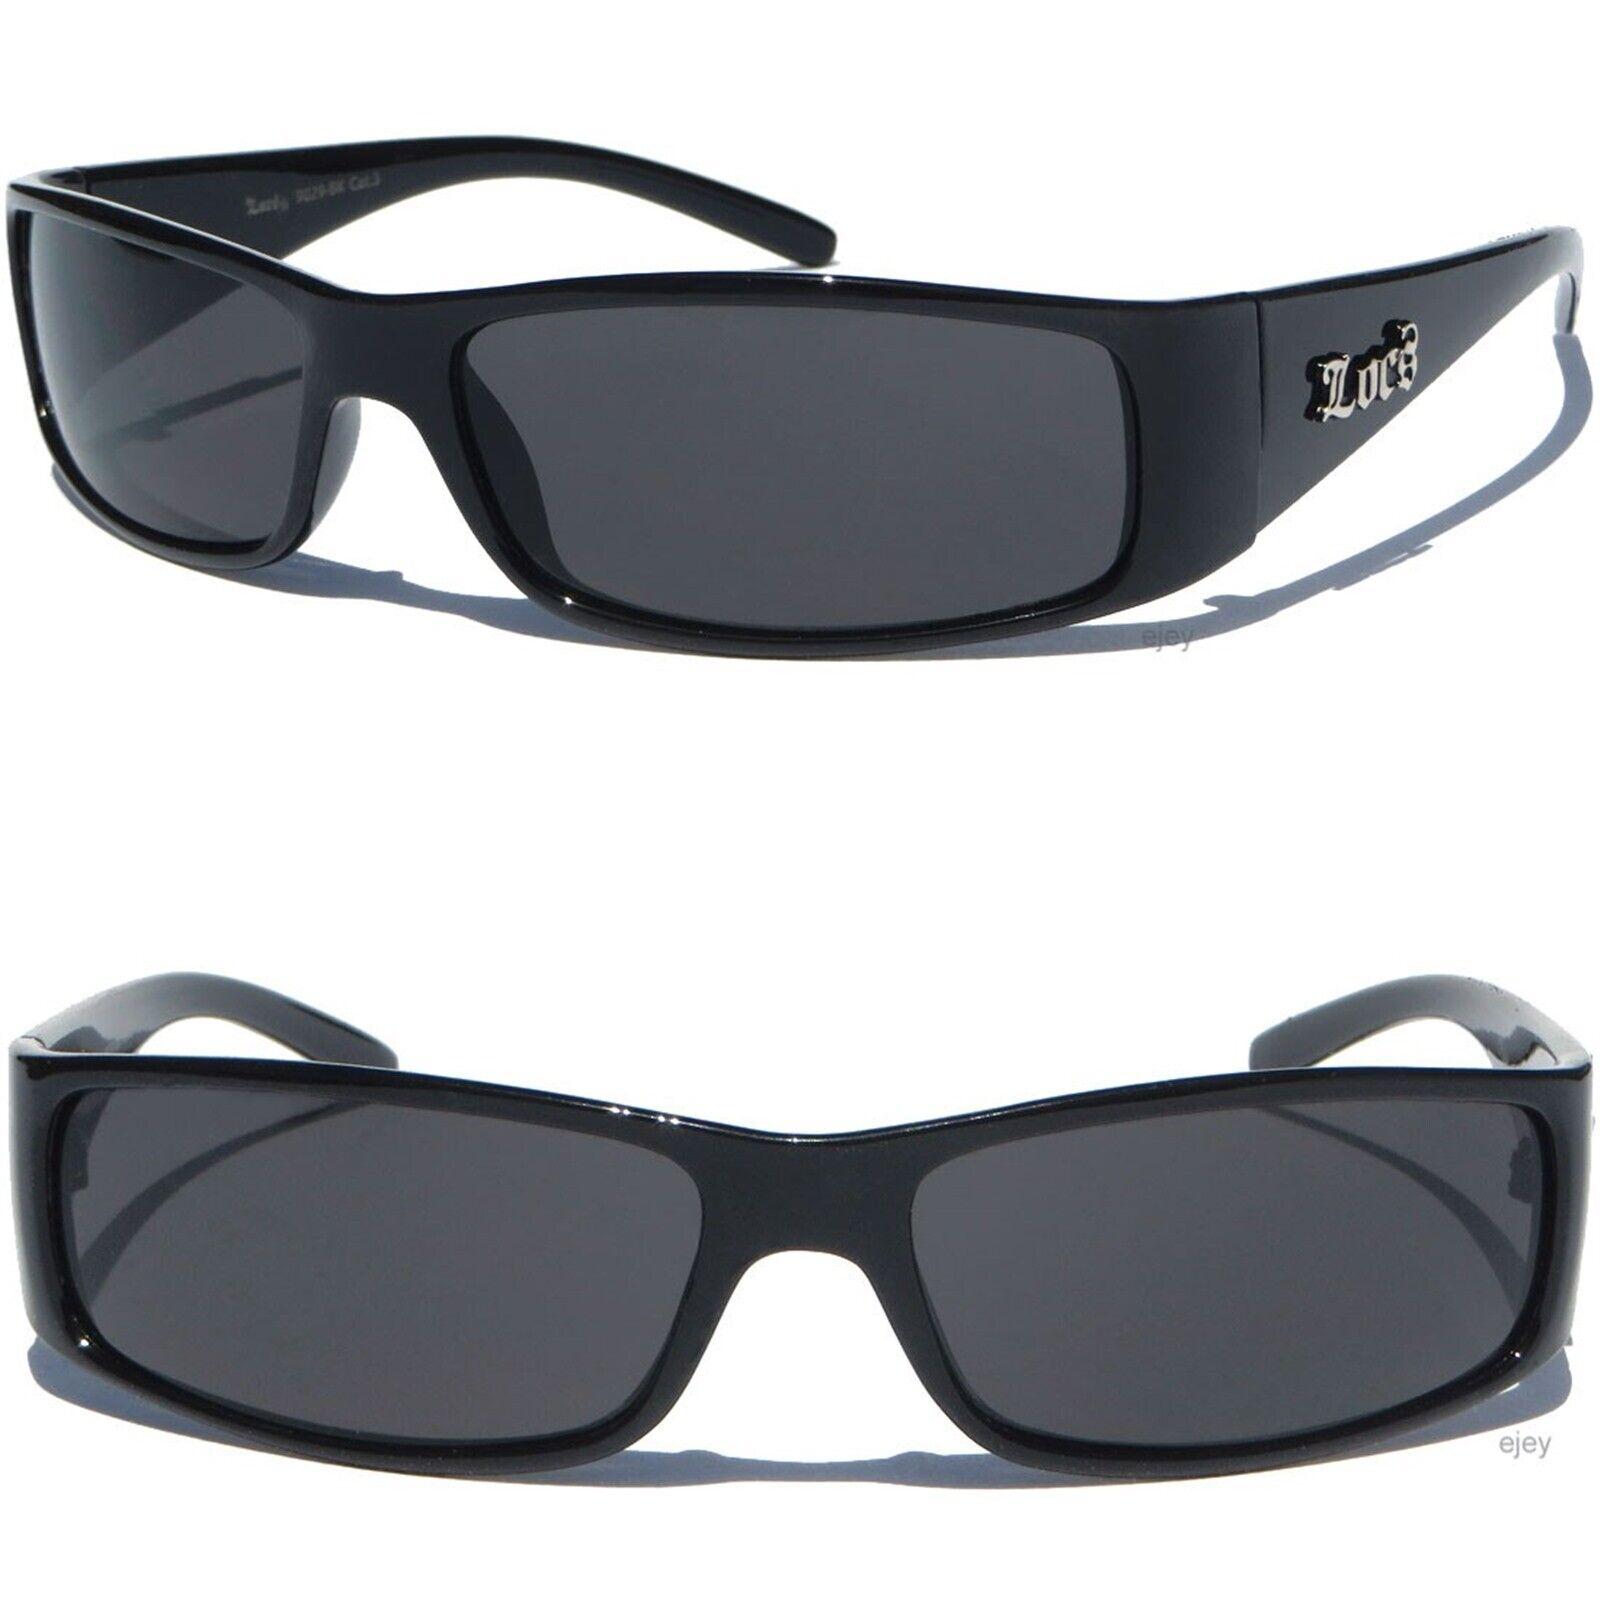 KIDS SIZE LOCS Sunglasses Child Size Boys Shades Black Frame Dark Lens Sunnies